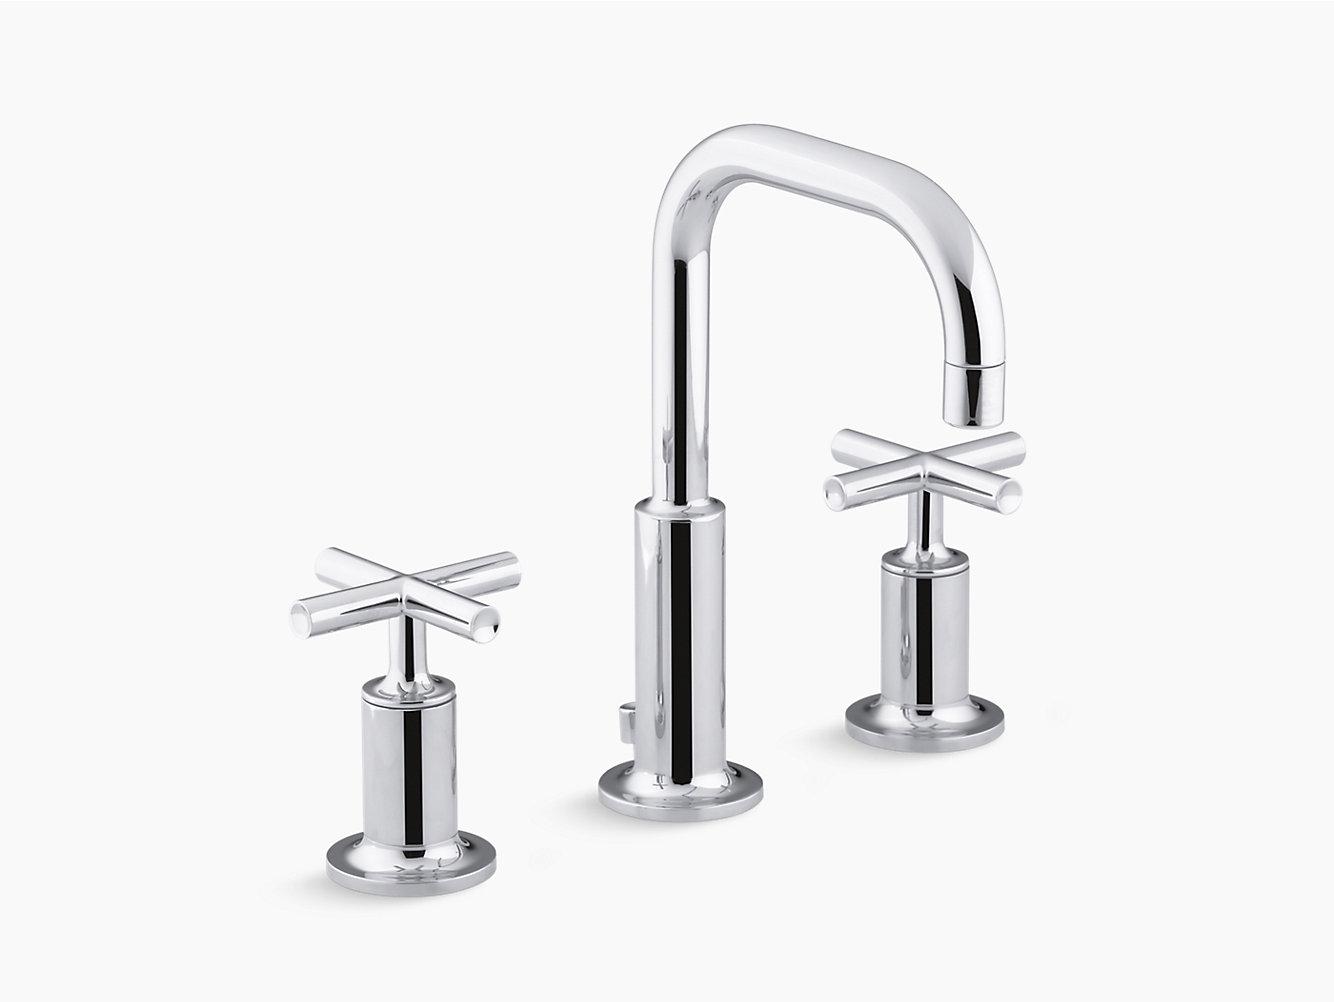 Purist Widespread Sink Faucet with Low Cross Handles | K-14406-3 ...